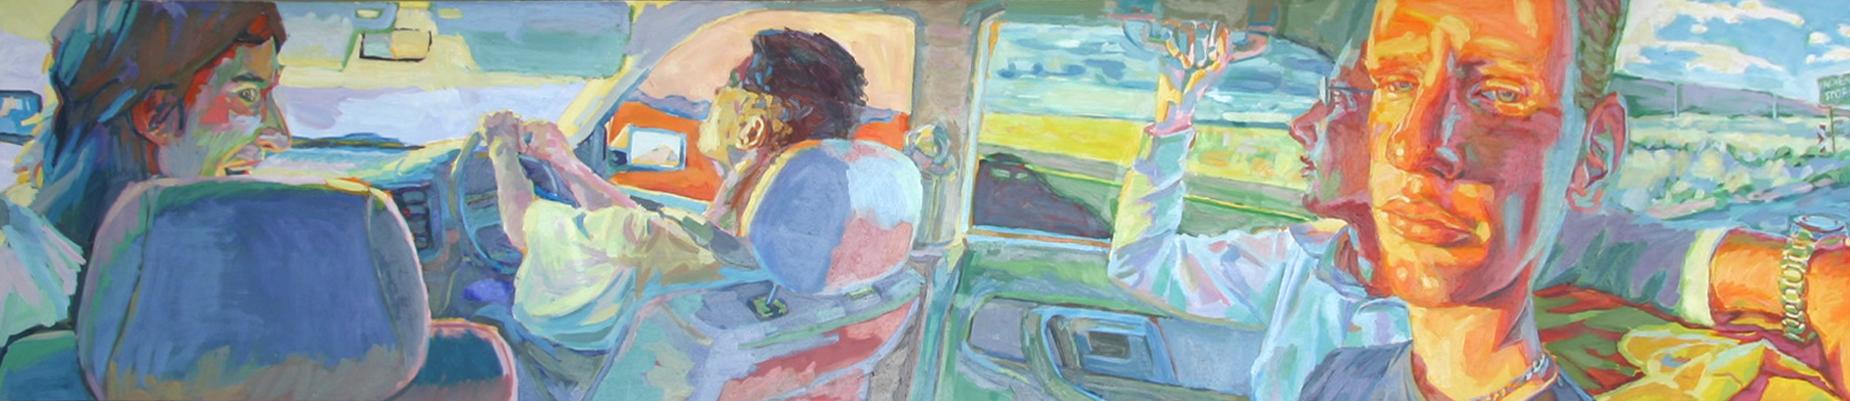 """Roadtrip to Bloem | Oil Painting"""